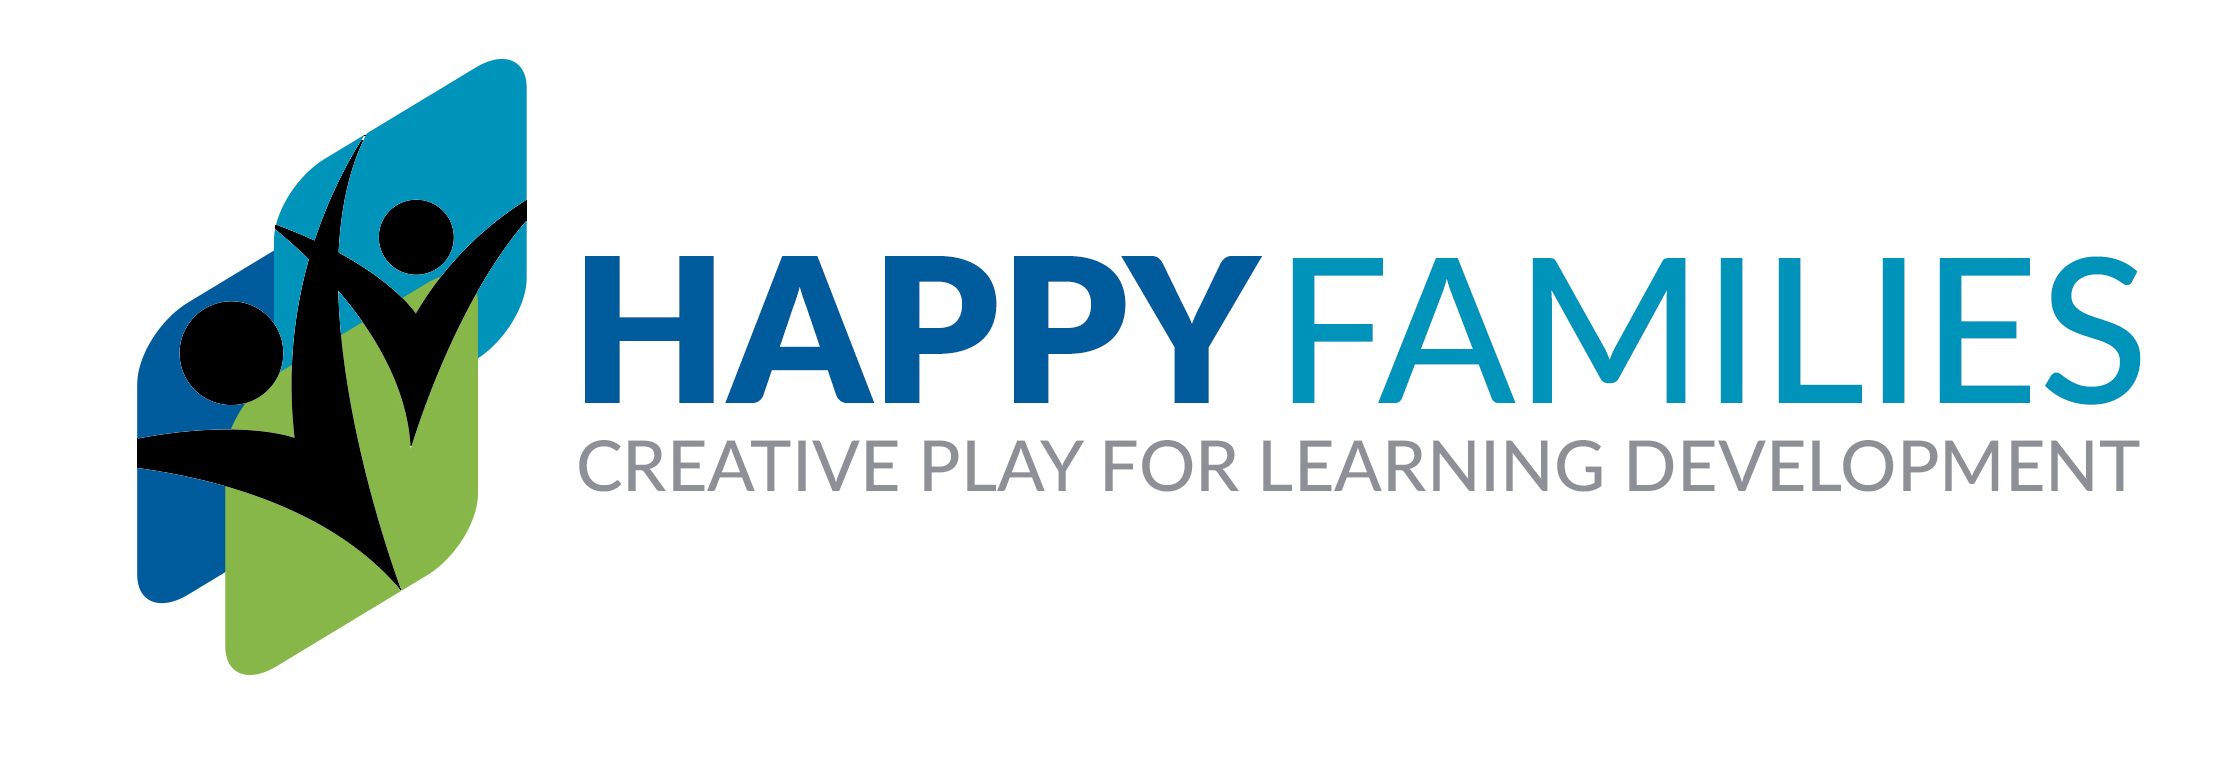 Happy Families Childcare Ltd